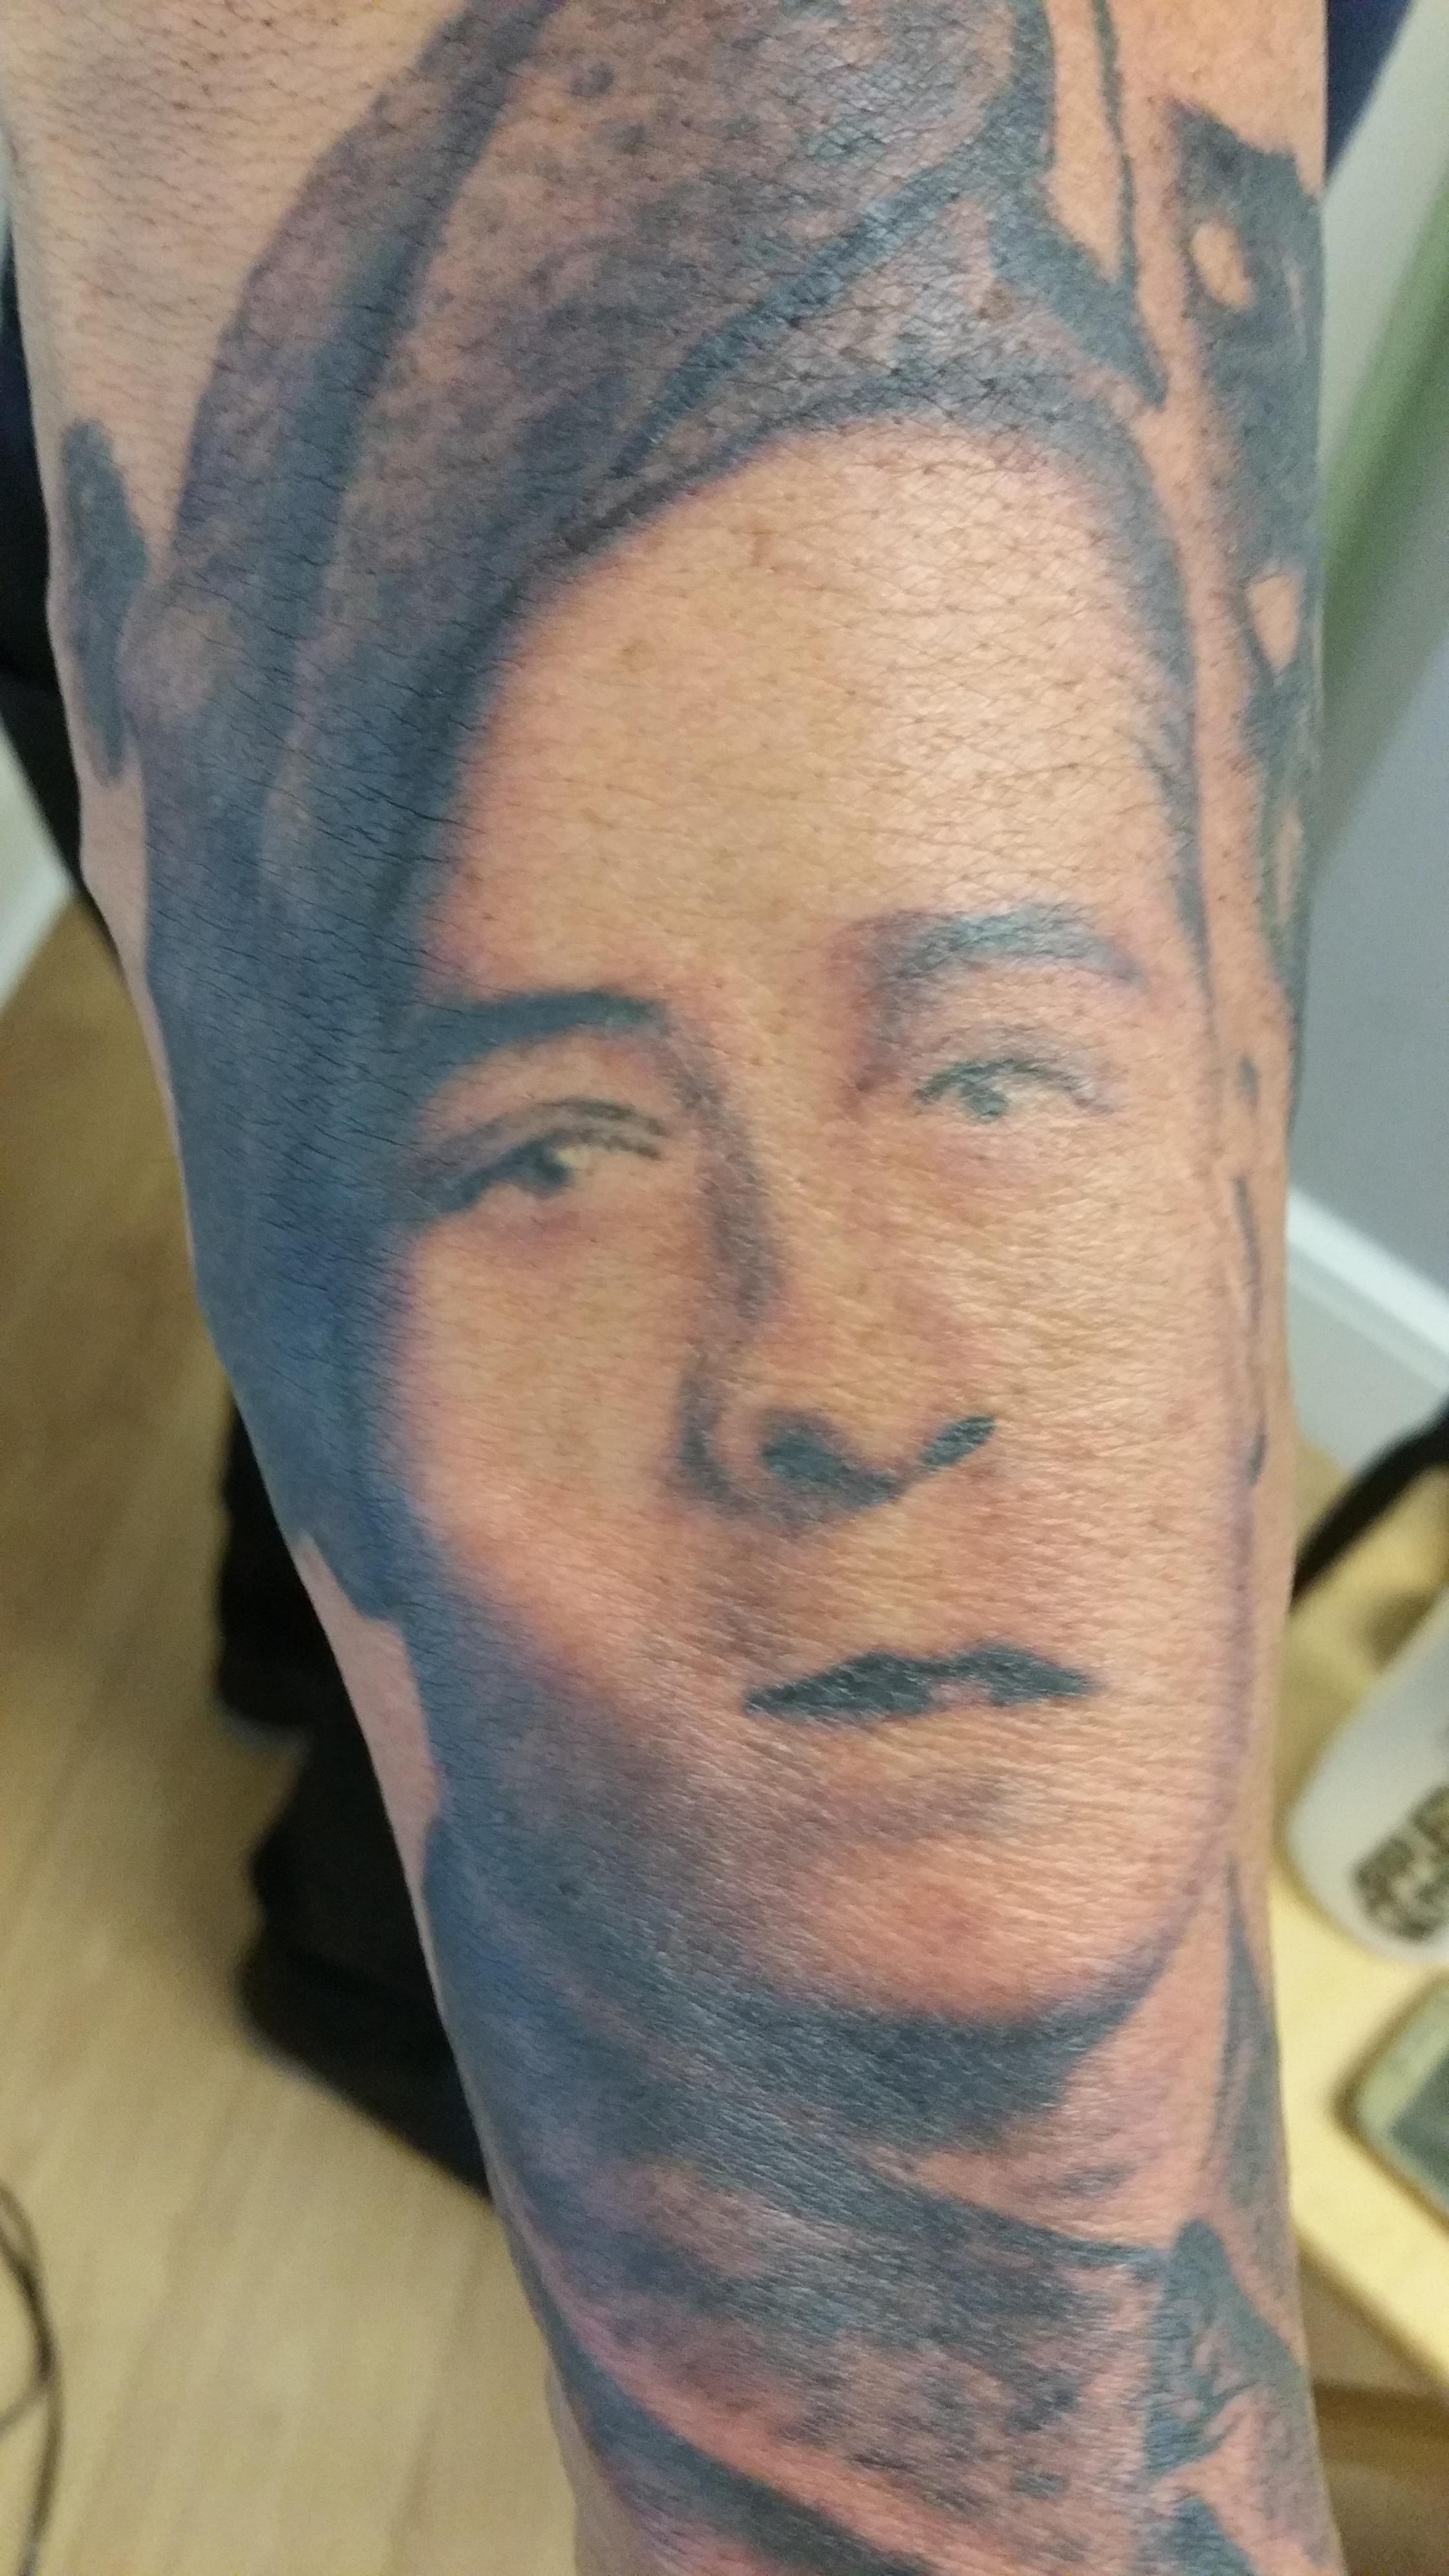 Portrait Tattoos Inkedskin Altrincham Manchester Inkedskin